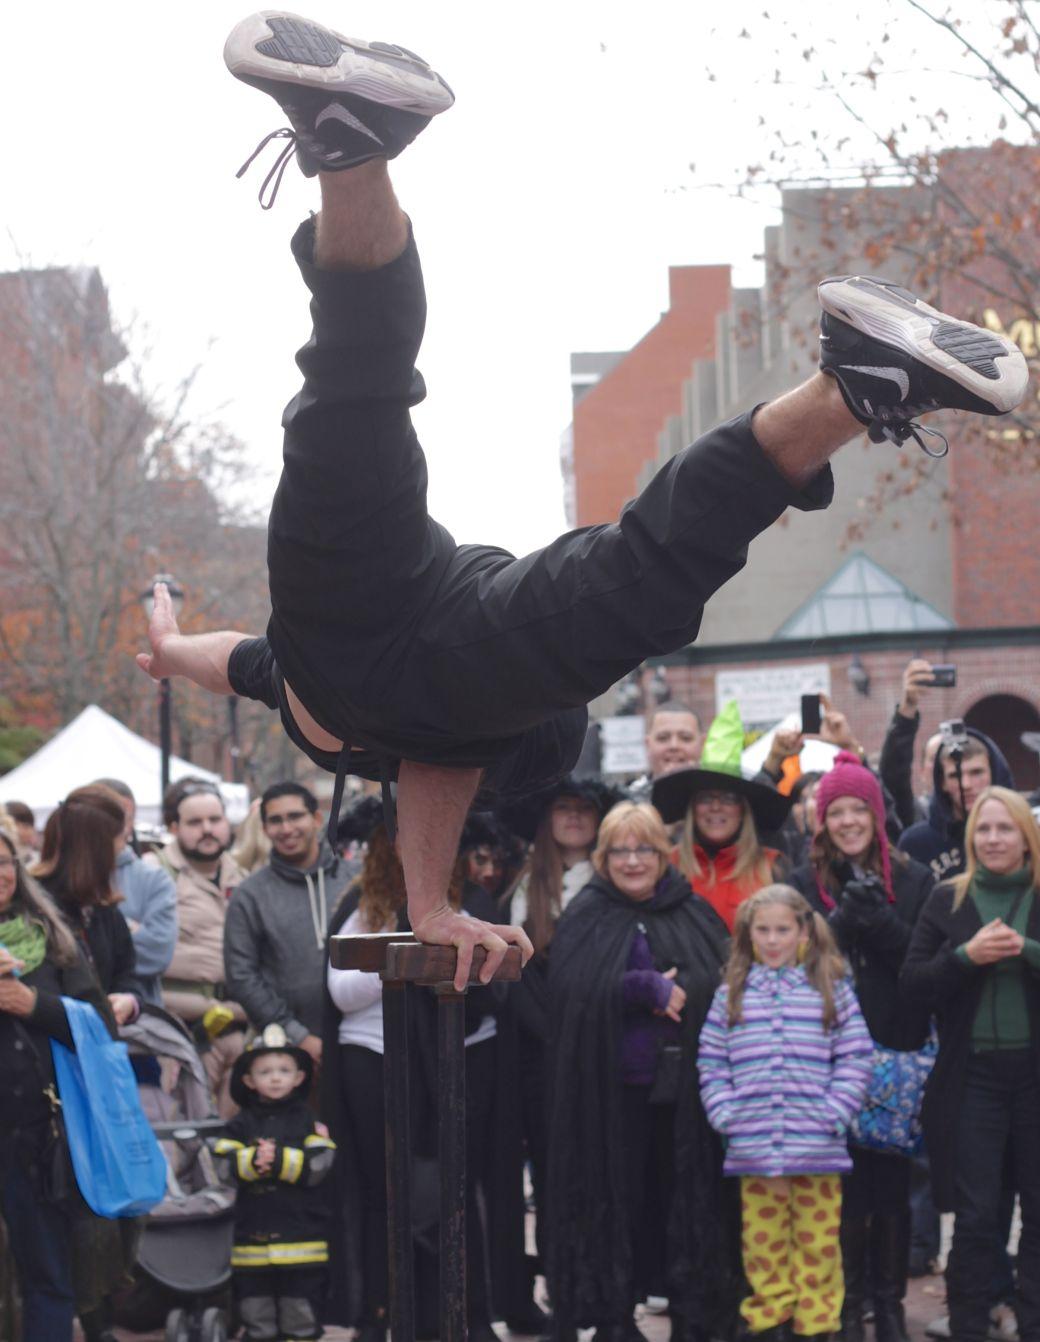 salem halloween october 31 2014 street performer gymnastic move